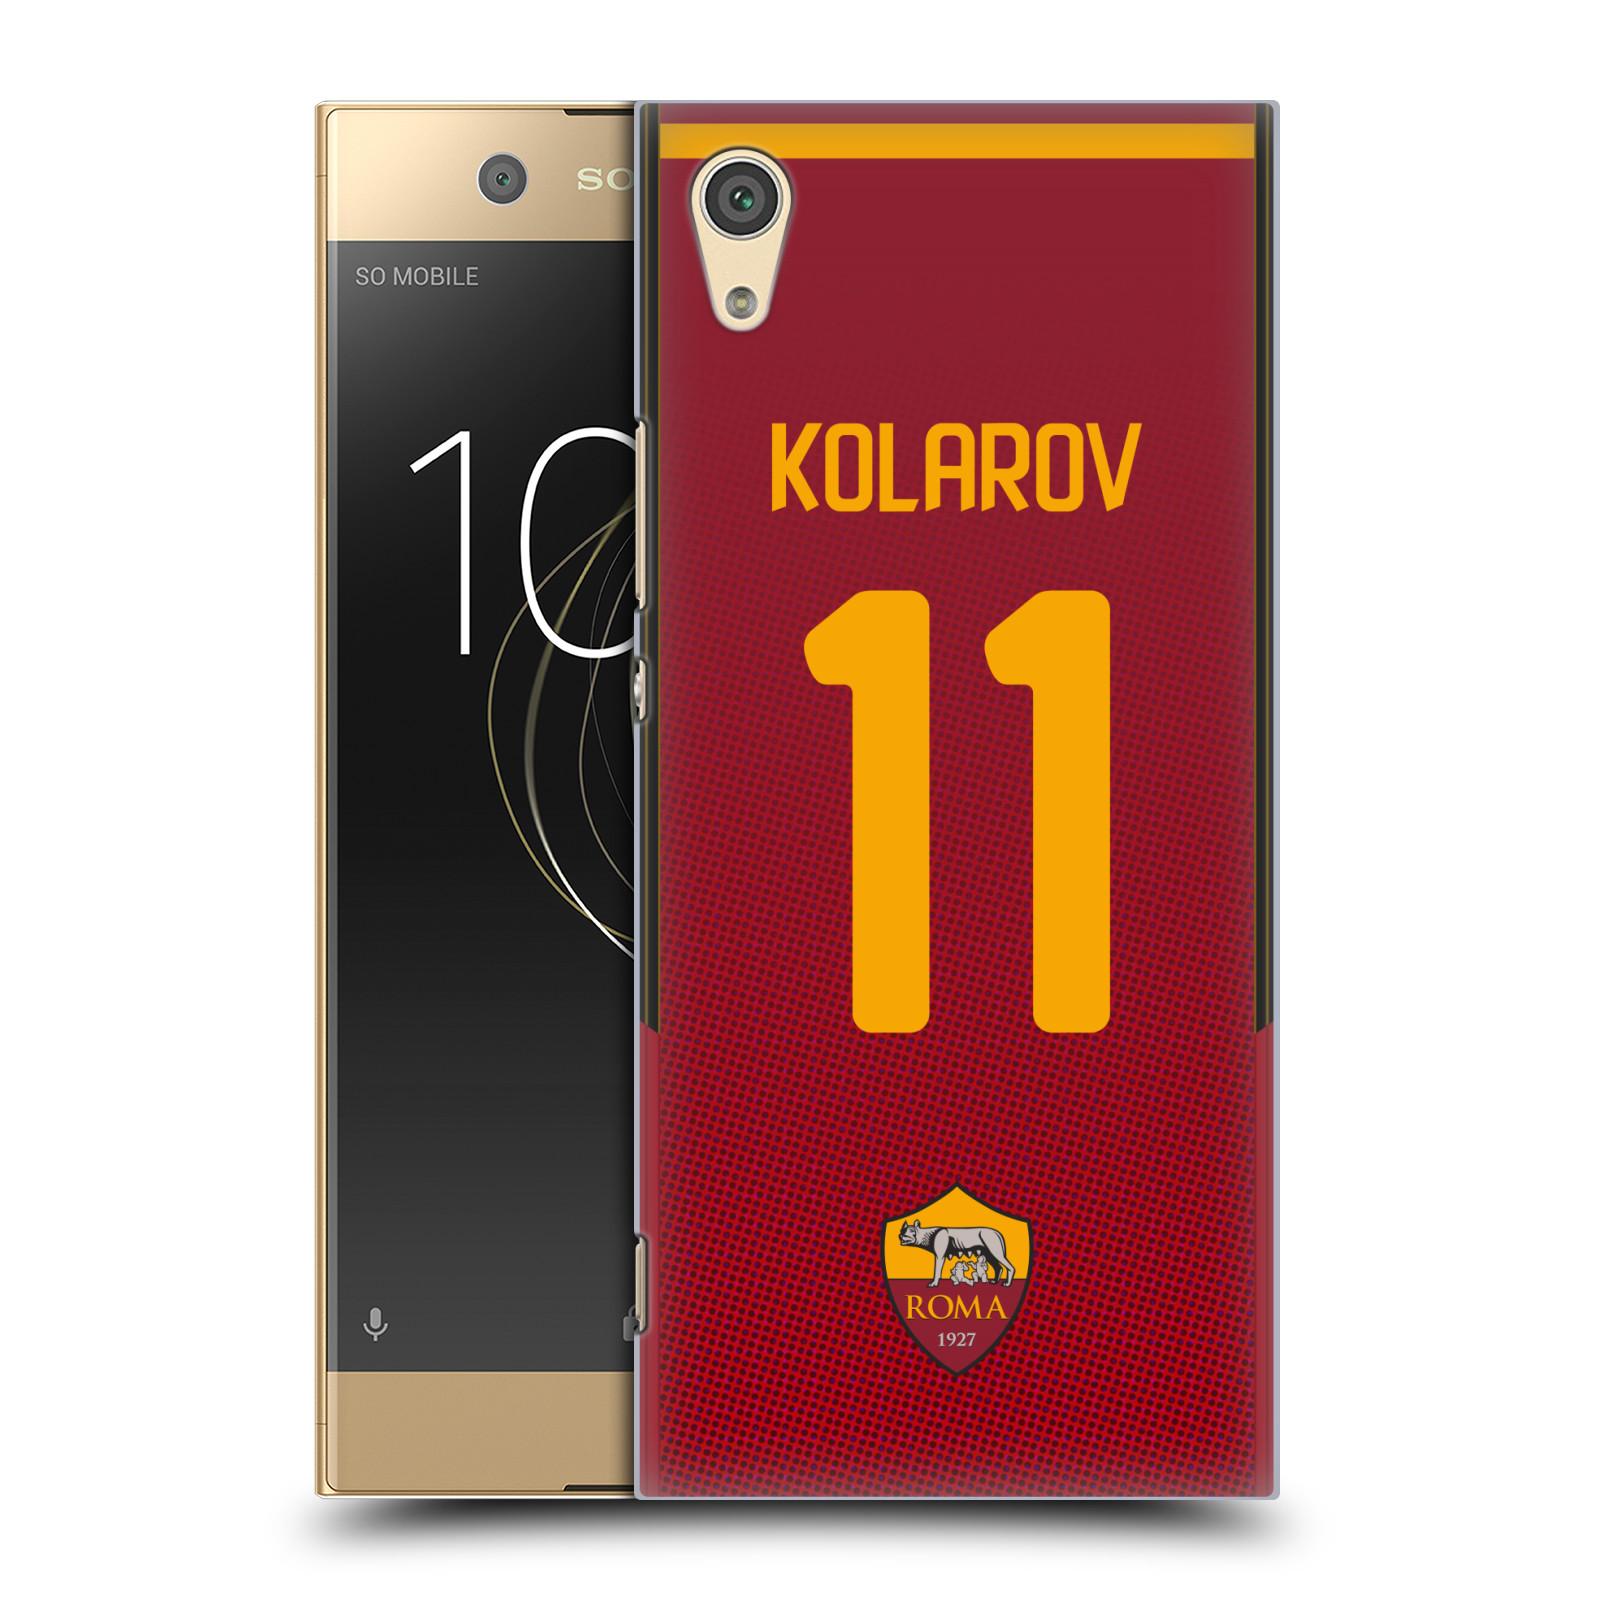 Oficial-como-ROMA-2017-18-jugadores-Home-Kit-grupo-1-volver-estuche-para-SONY-telefonos-1